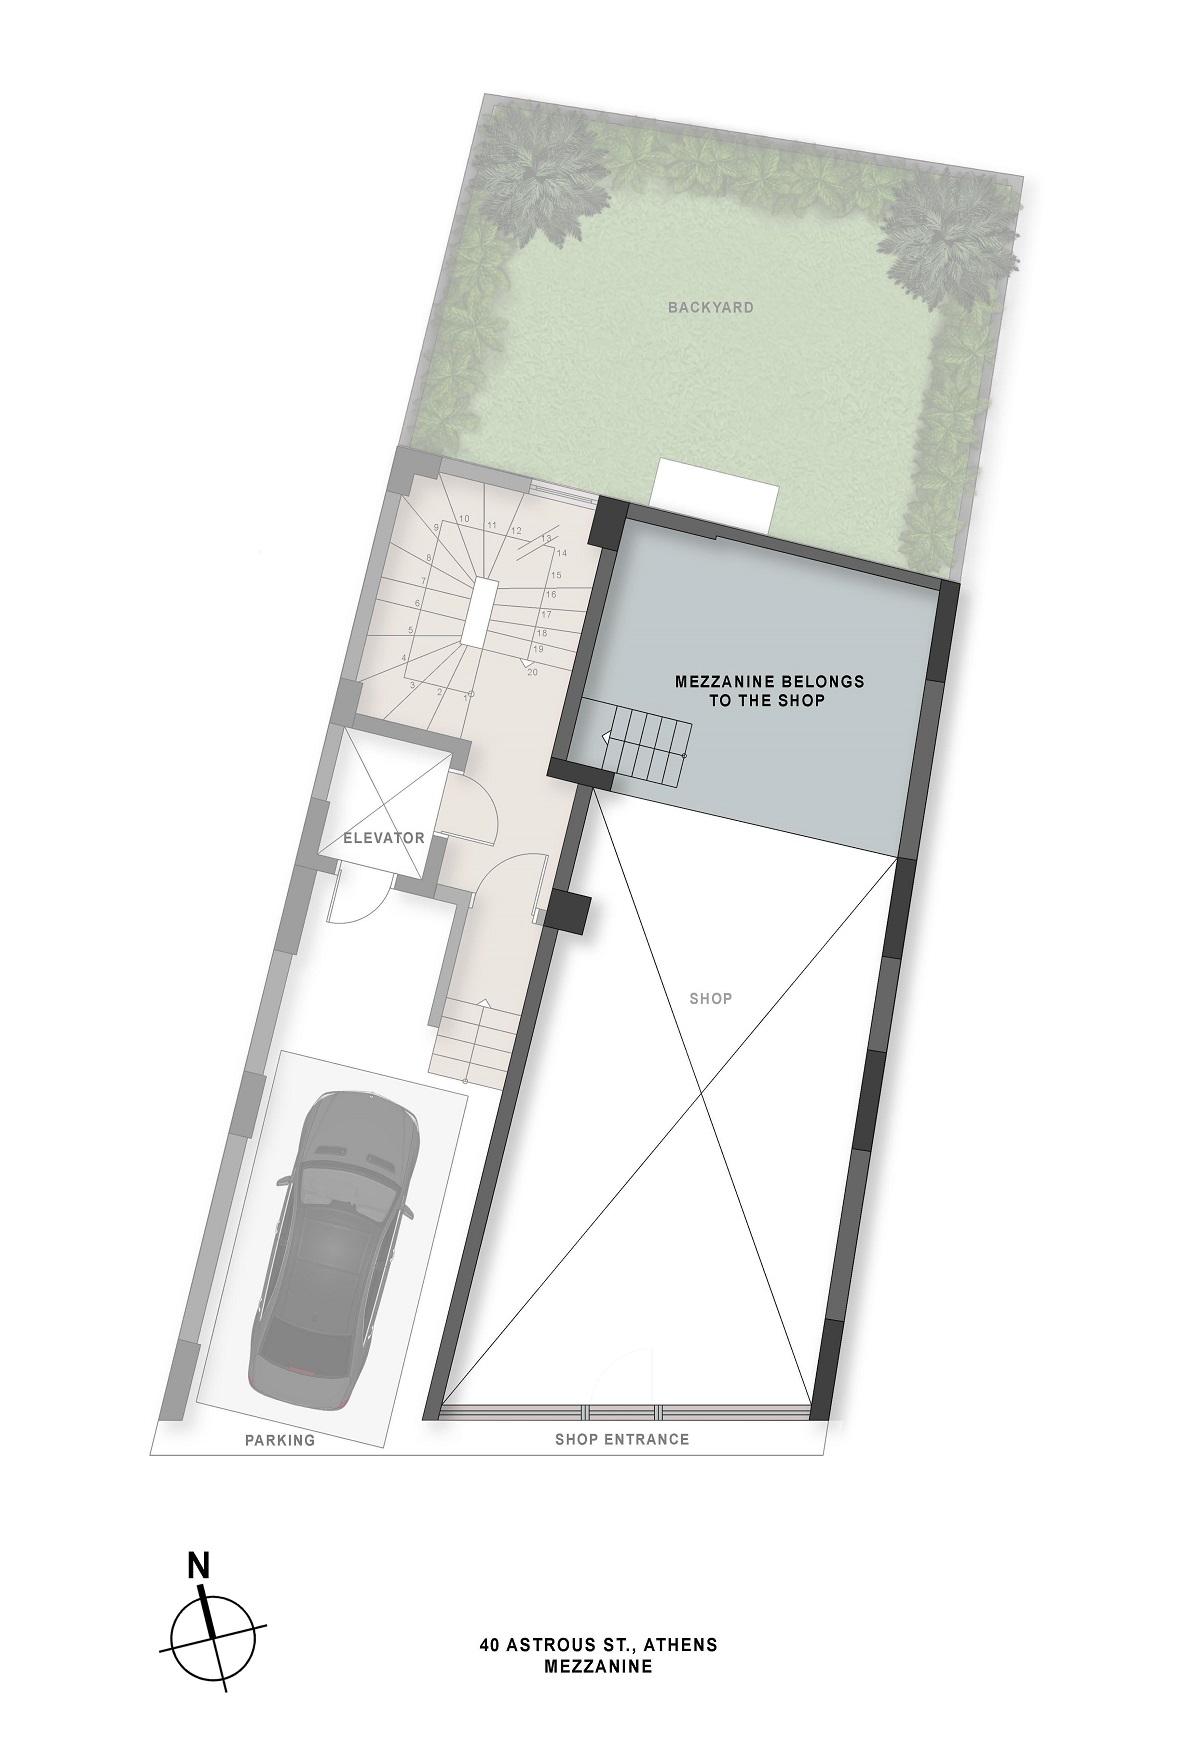 Astrous 40 mezzanine plan